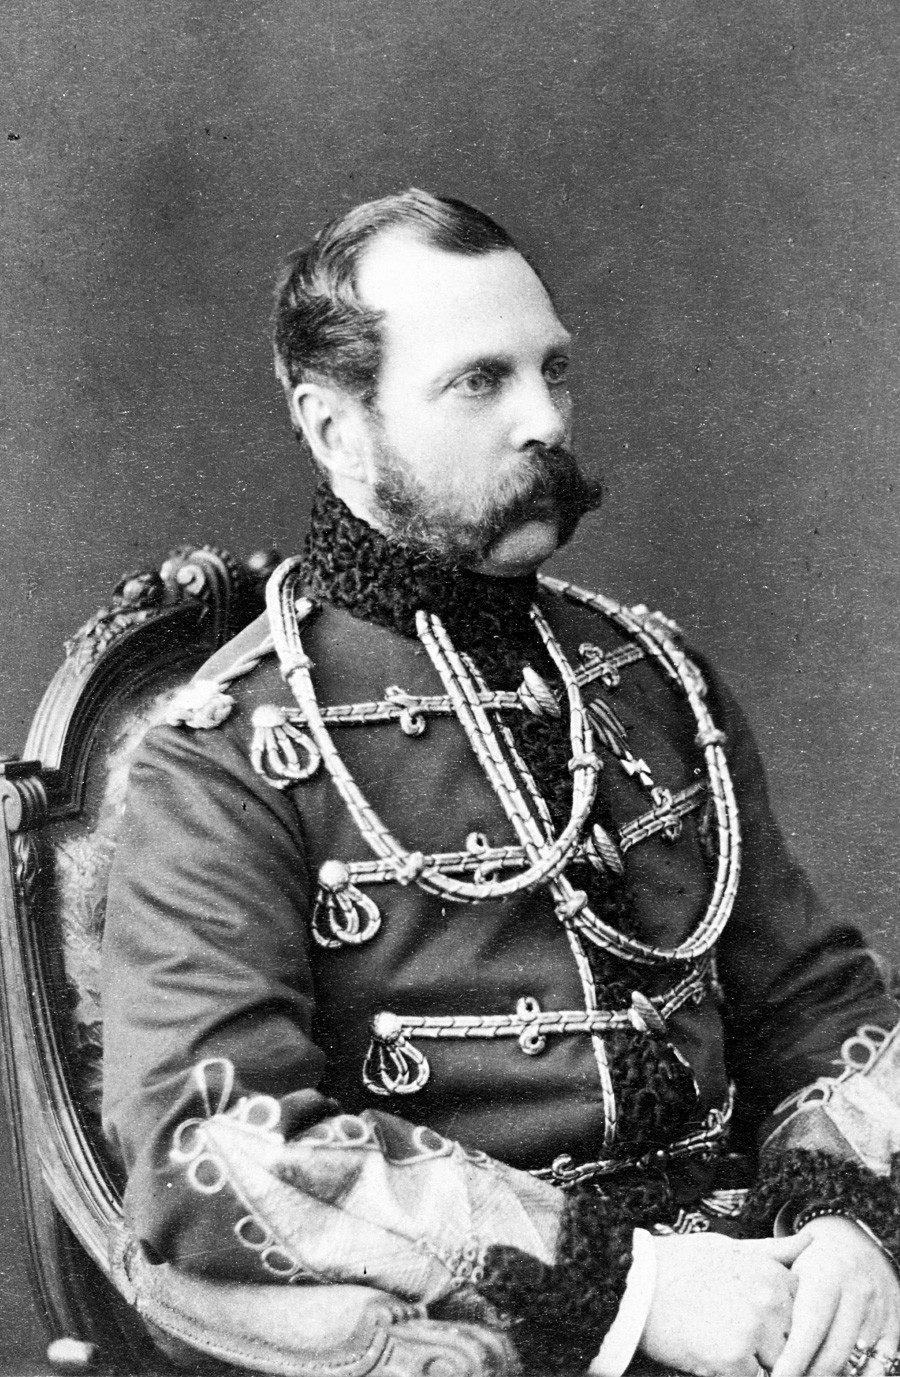 O tsar Alexandre 2°, imperador da Rússia entre 1870 e 1886.